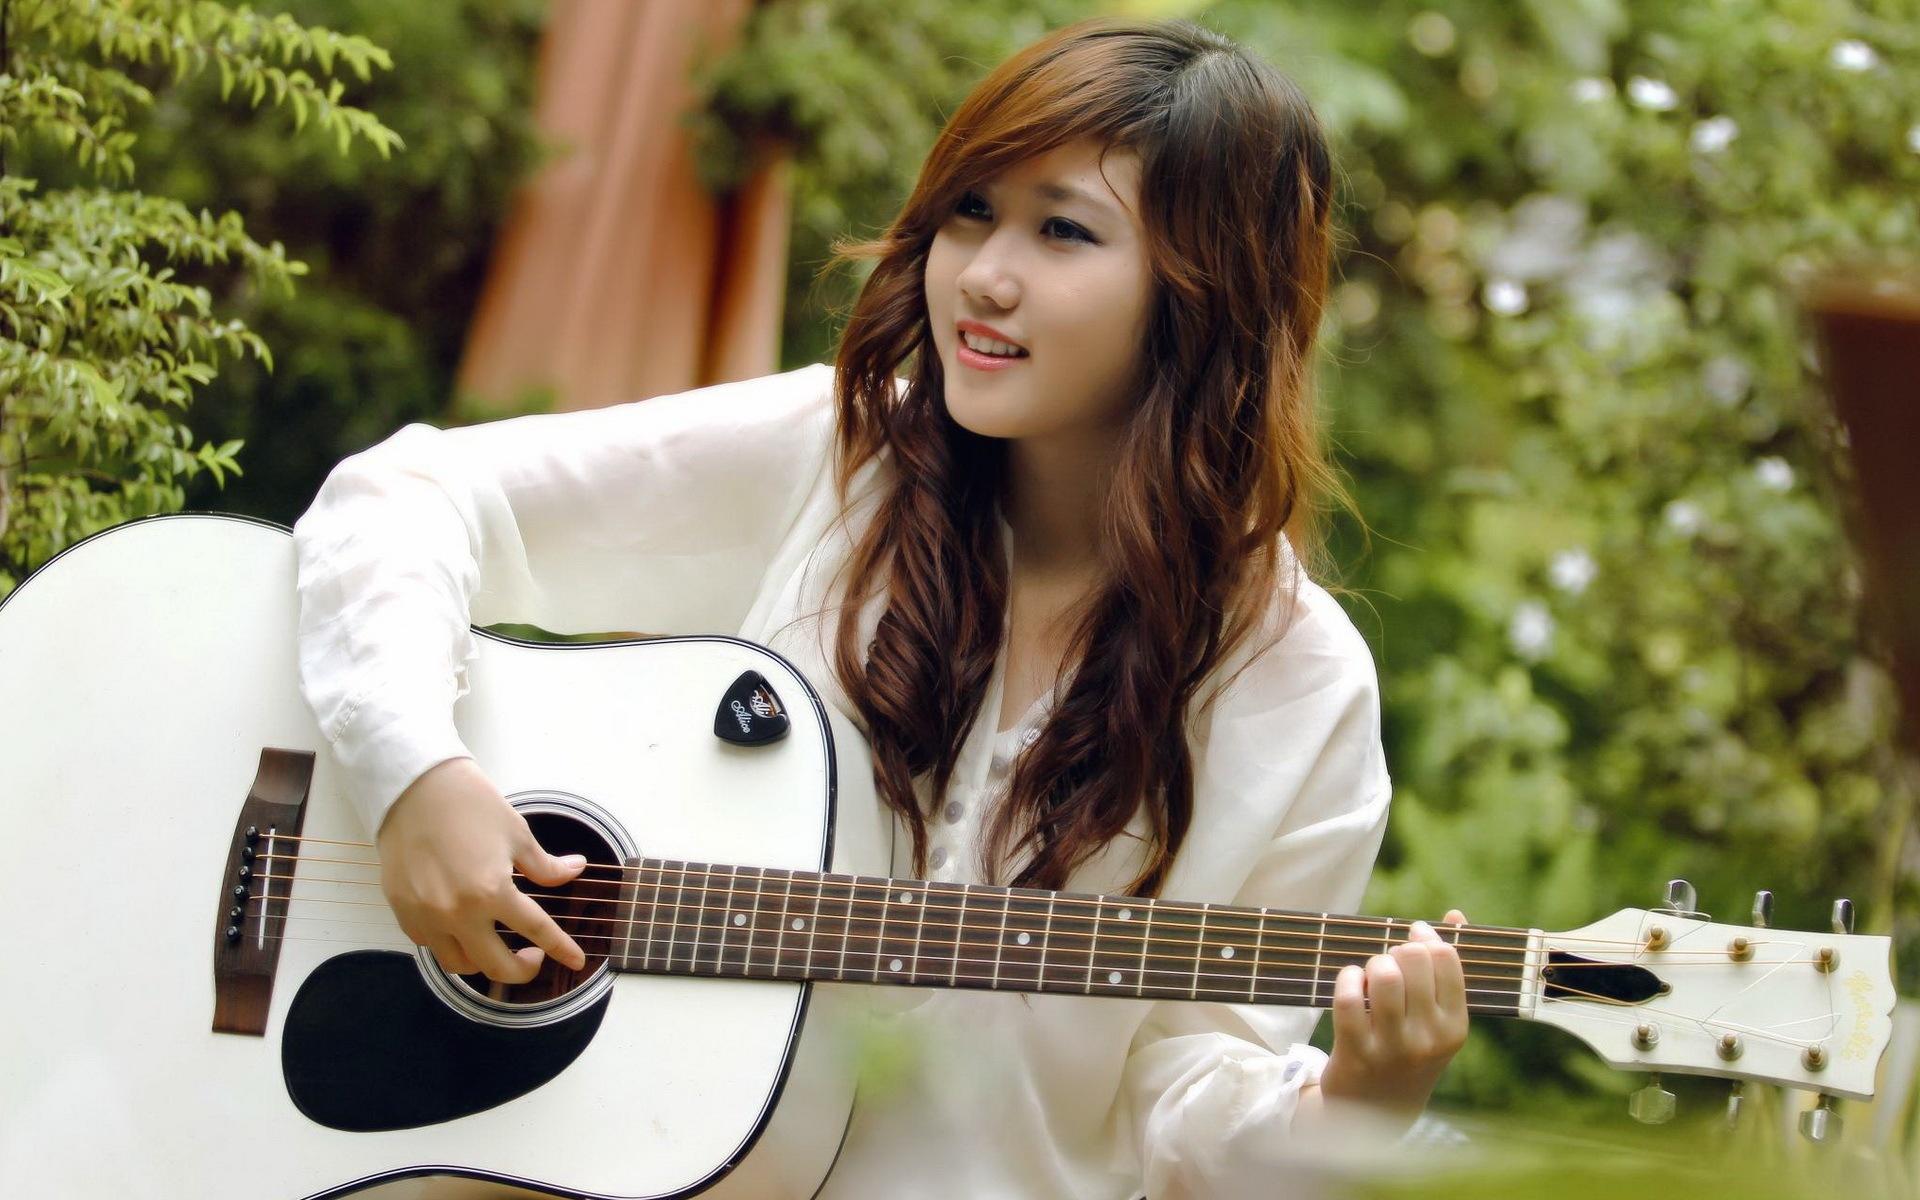 cambodian girl guitar soundskool